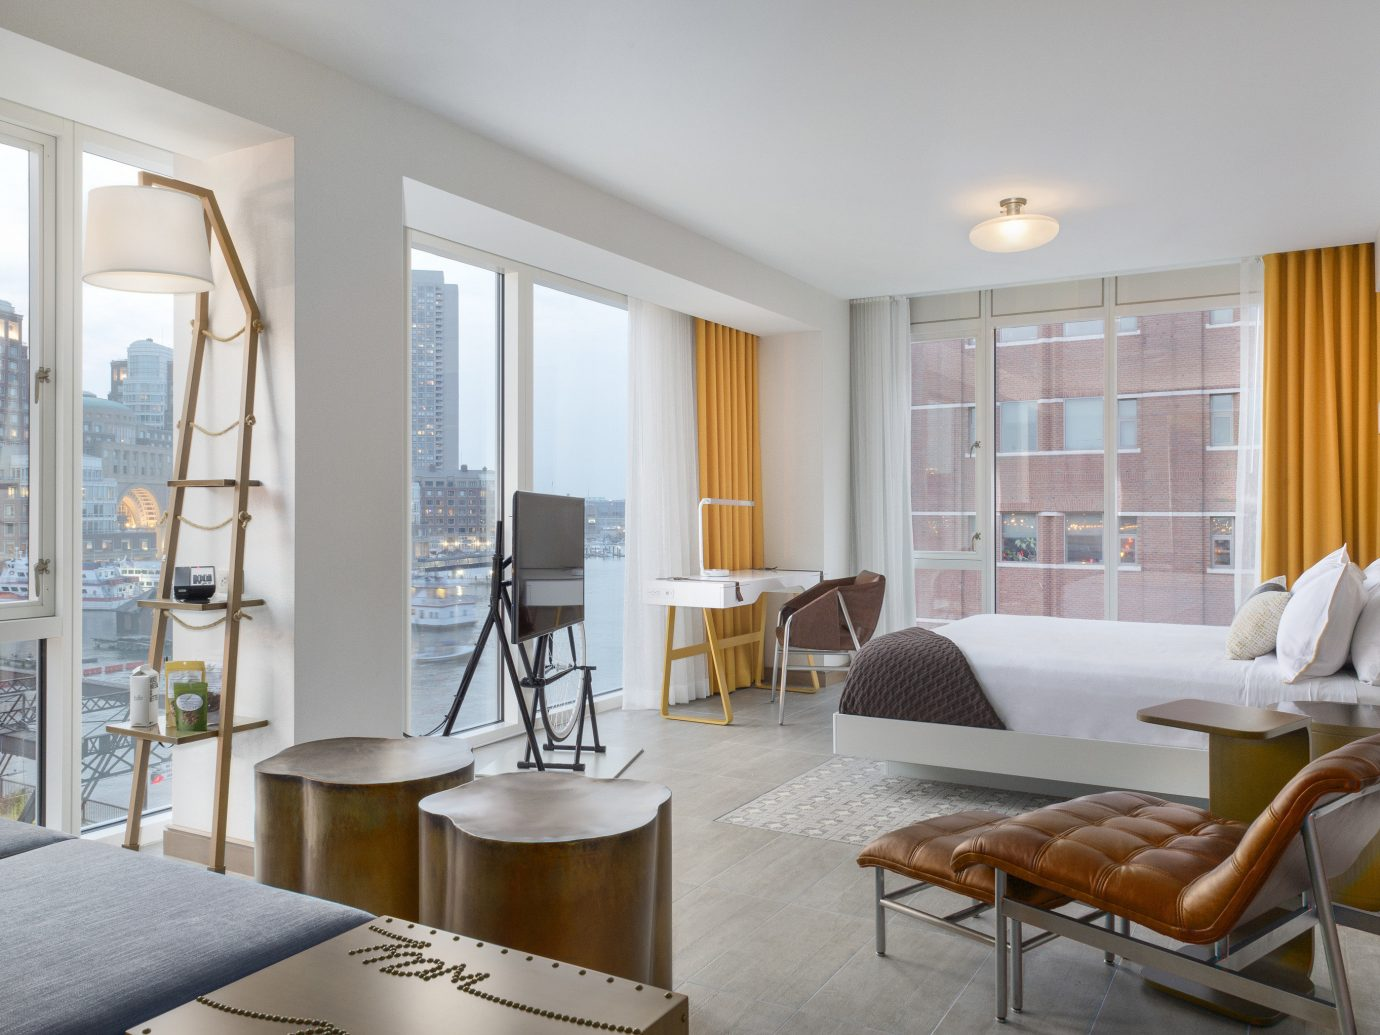 Bedroom of Fairmont Copley Plaza Hotel in Boston